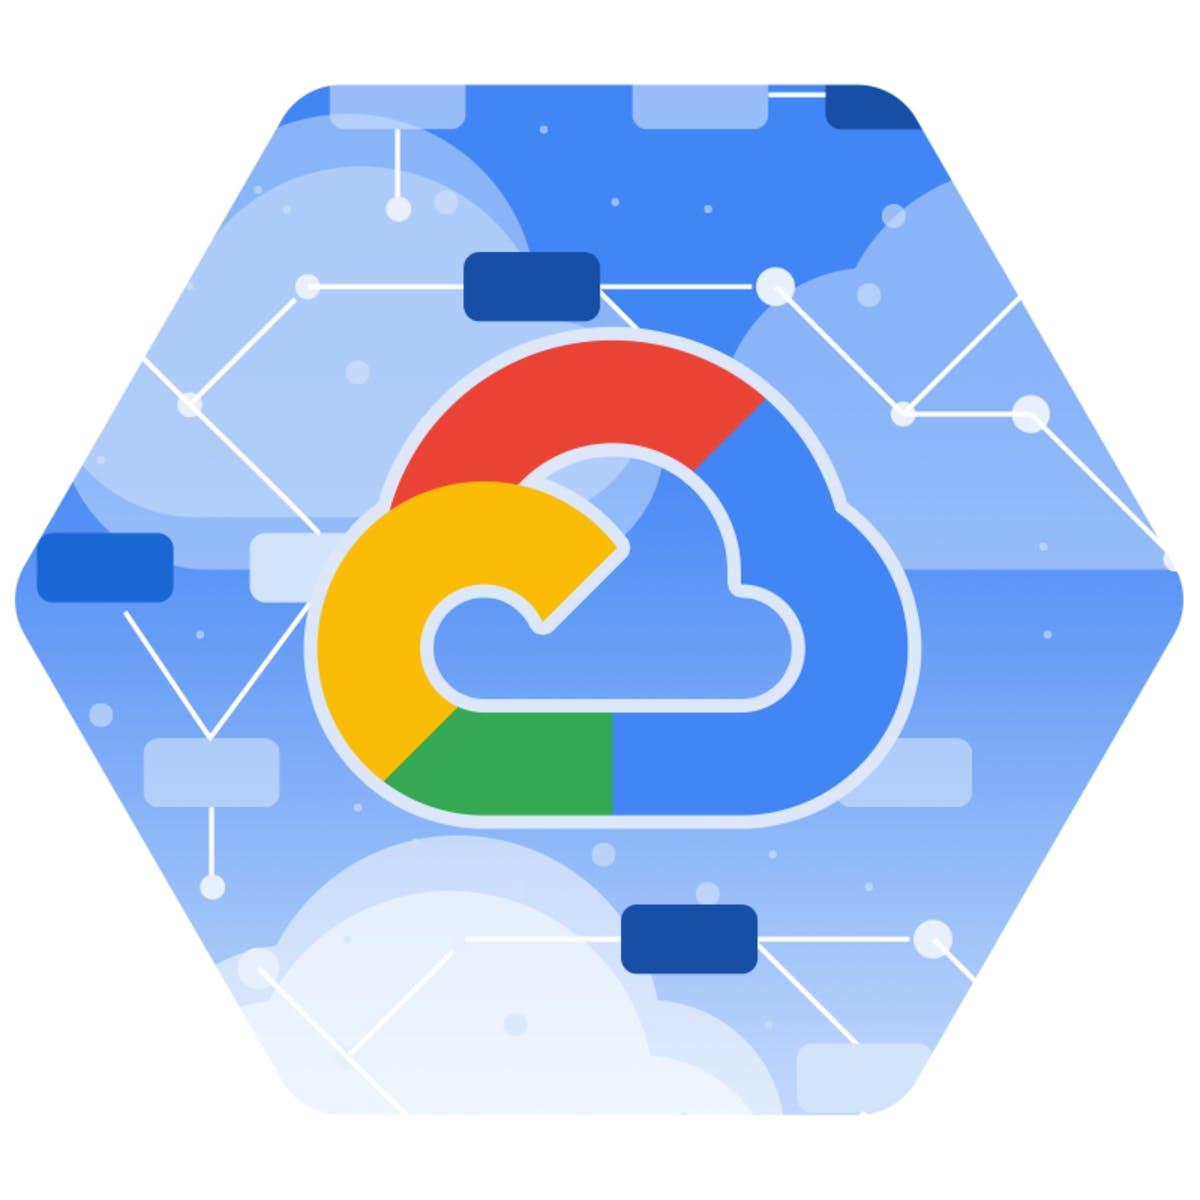 Preparing for the Google Cloud Professional Cloud Architect Exam